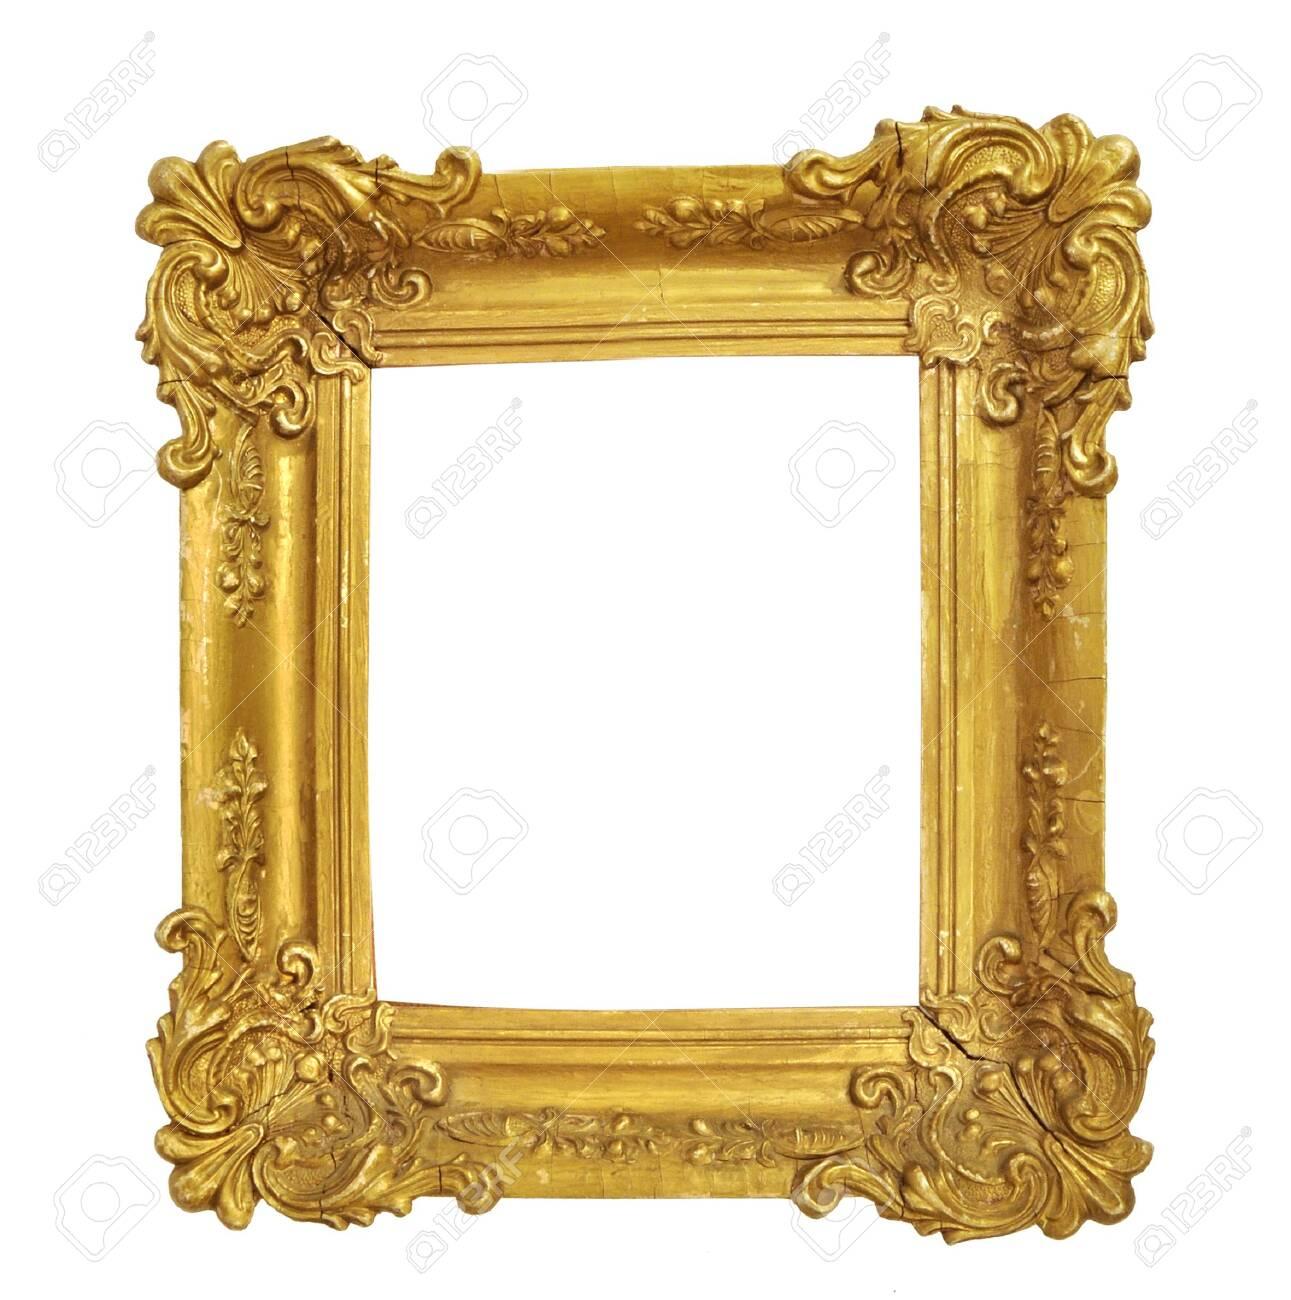 Isolated Photo Frame, Little Golden Antique Photo Frame, Vintage Frame. - 135894245